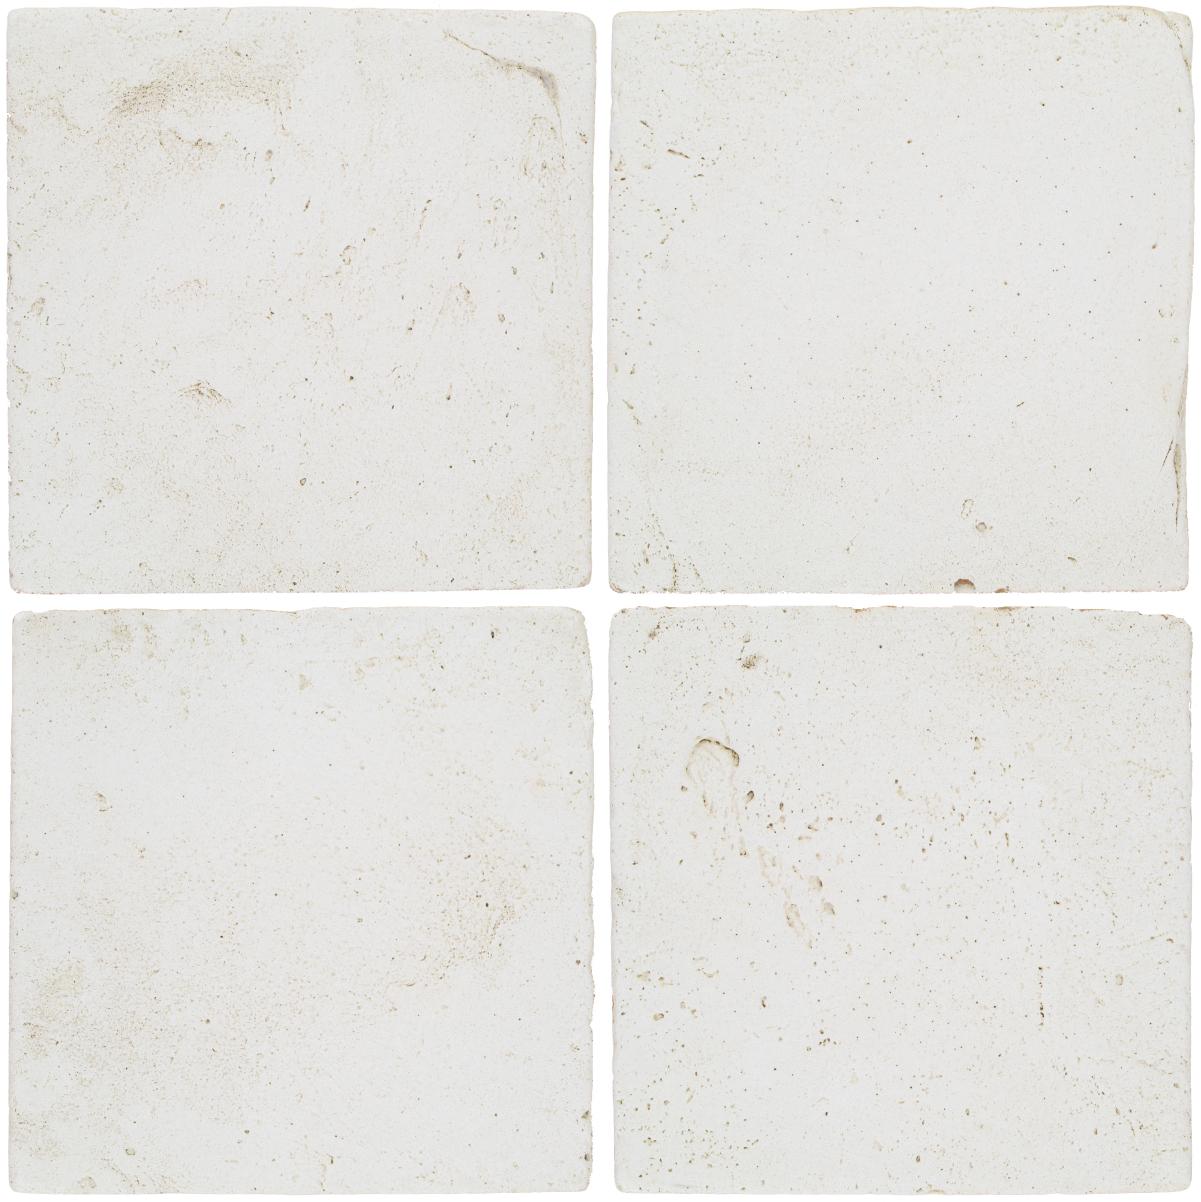 VTG-PGFW (Floral White)